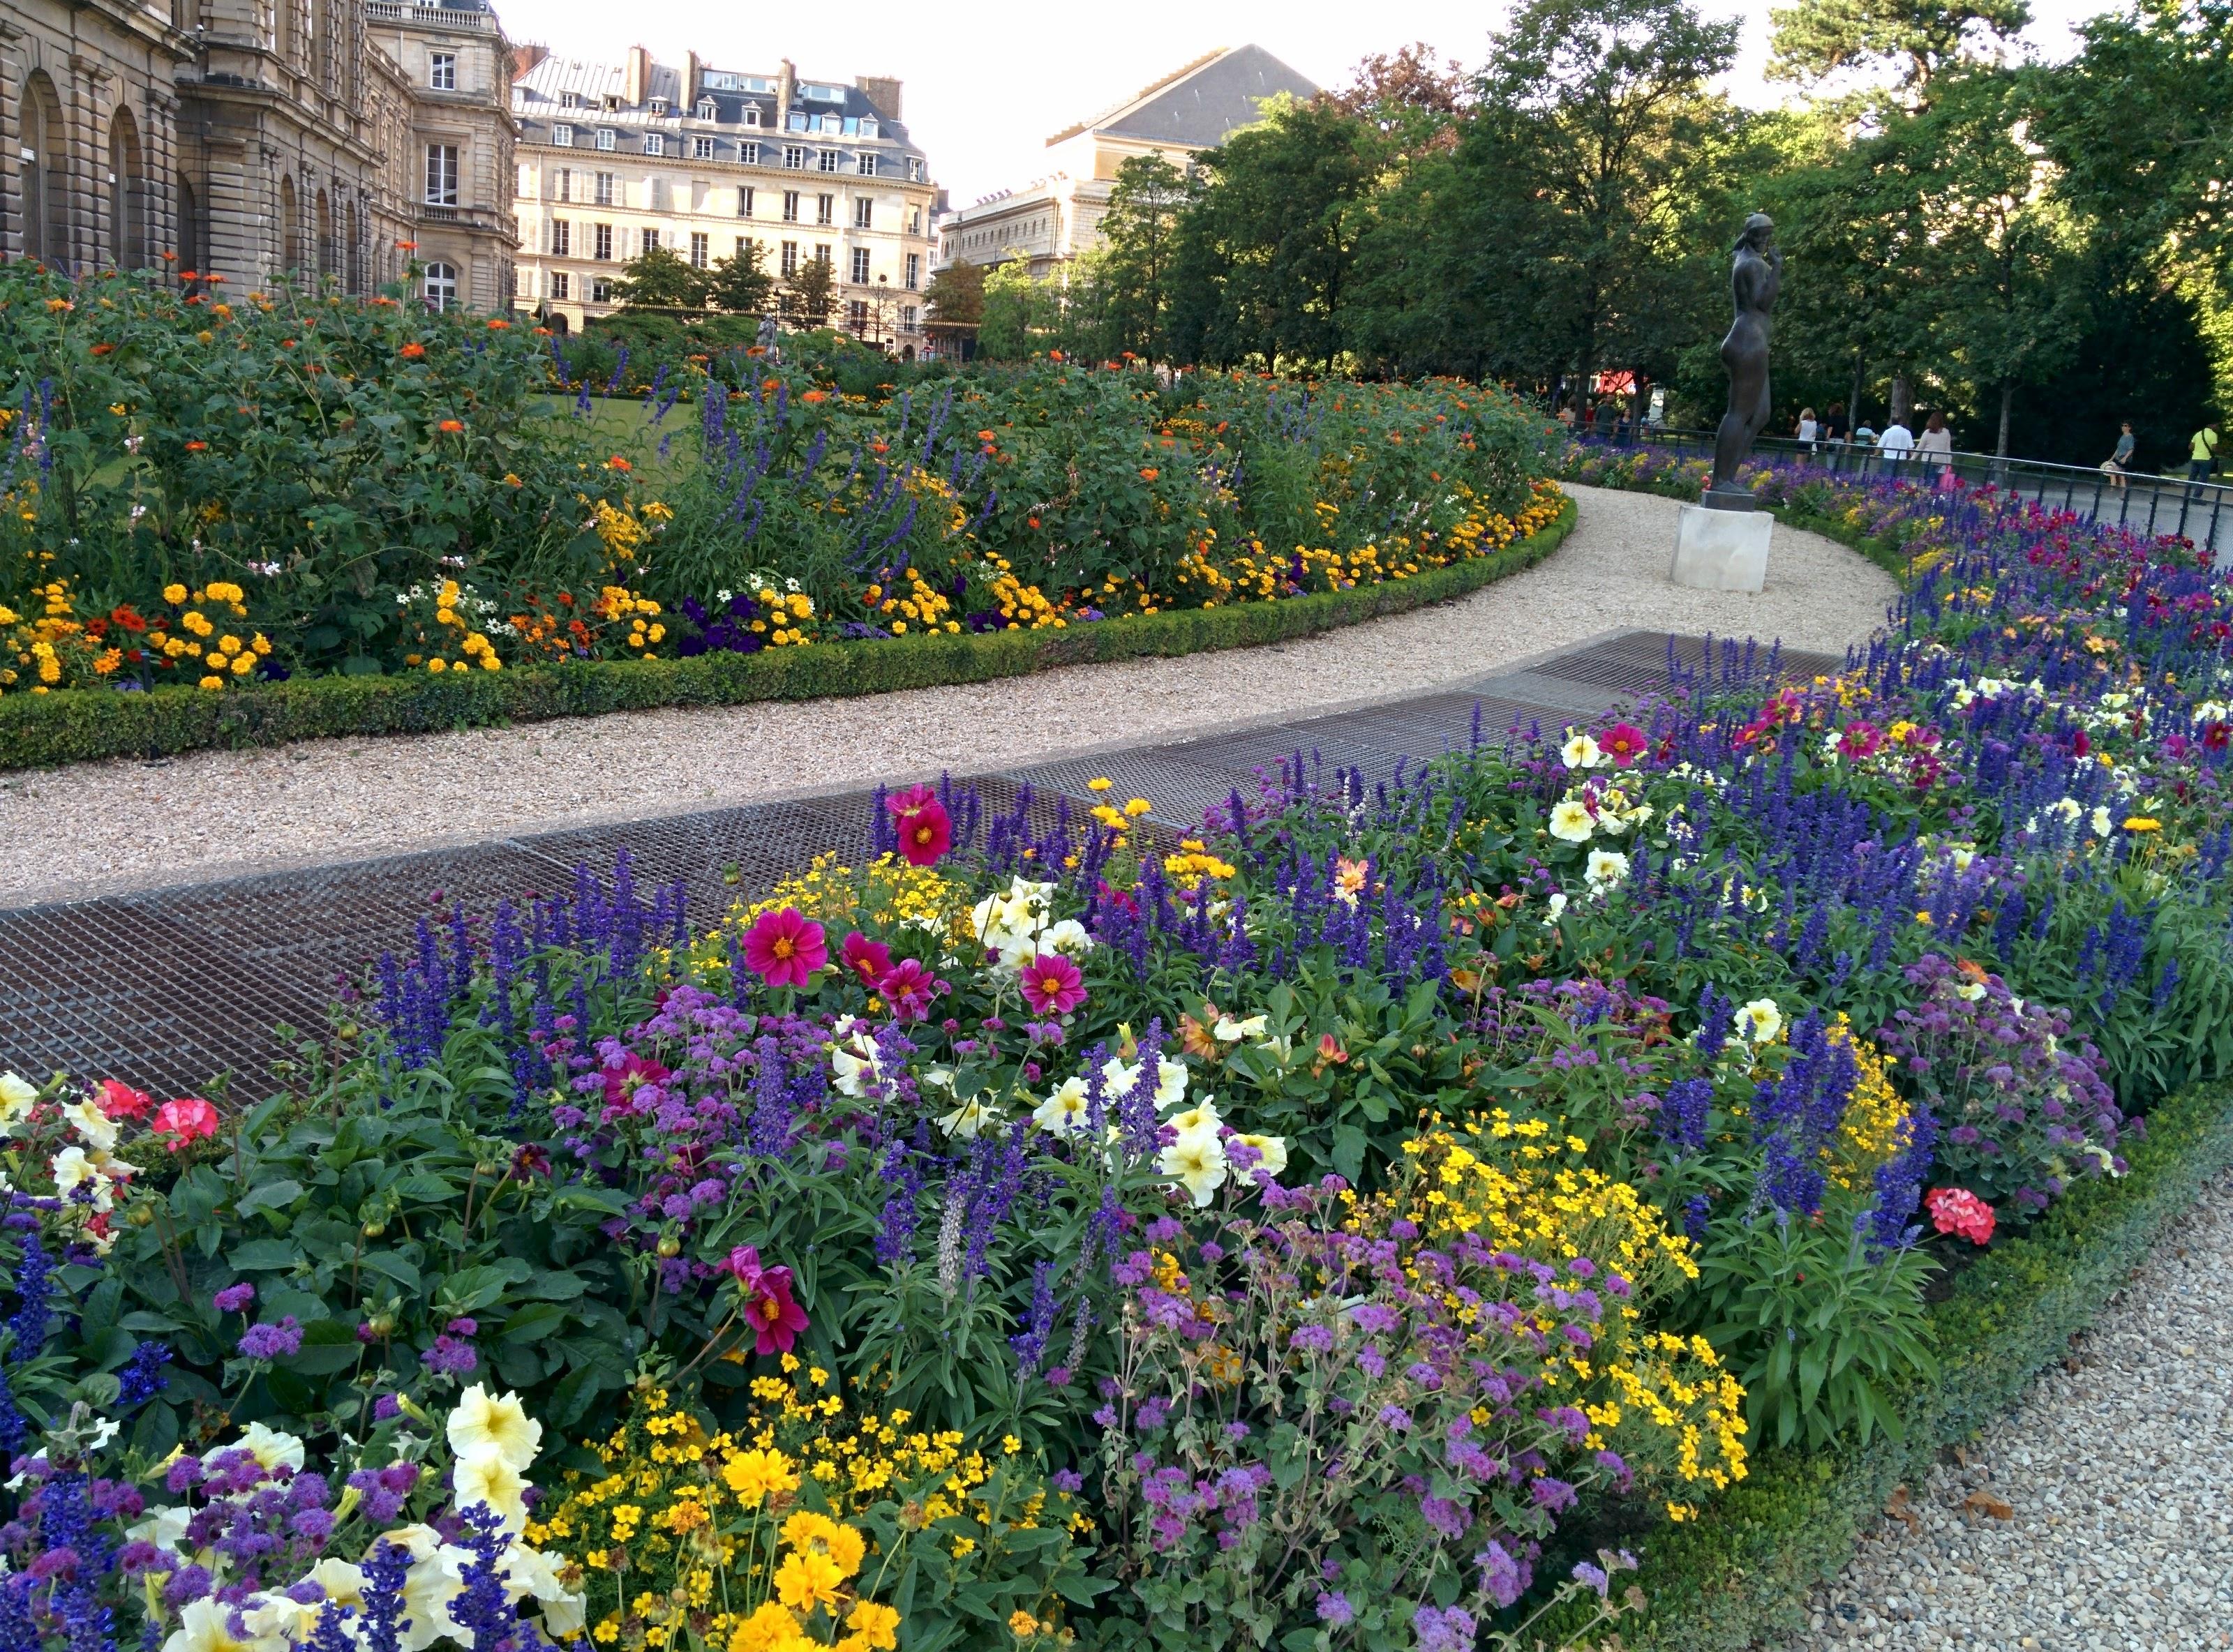 Le Jardin de Luxembourg: FREE concerts @ Le kiosque à musique | Just Some Girl in France